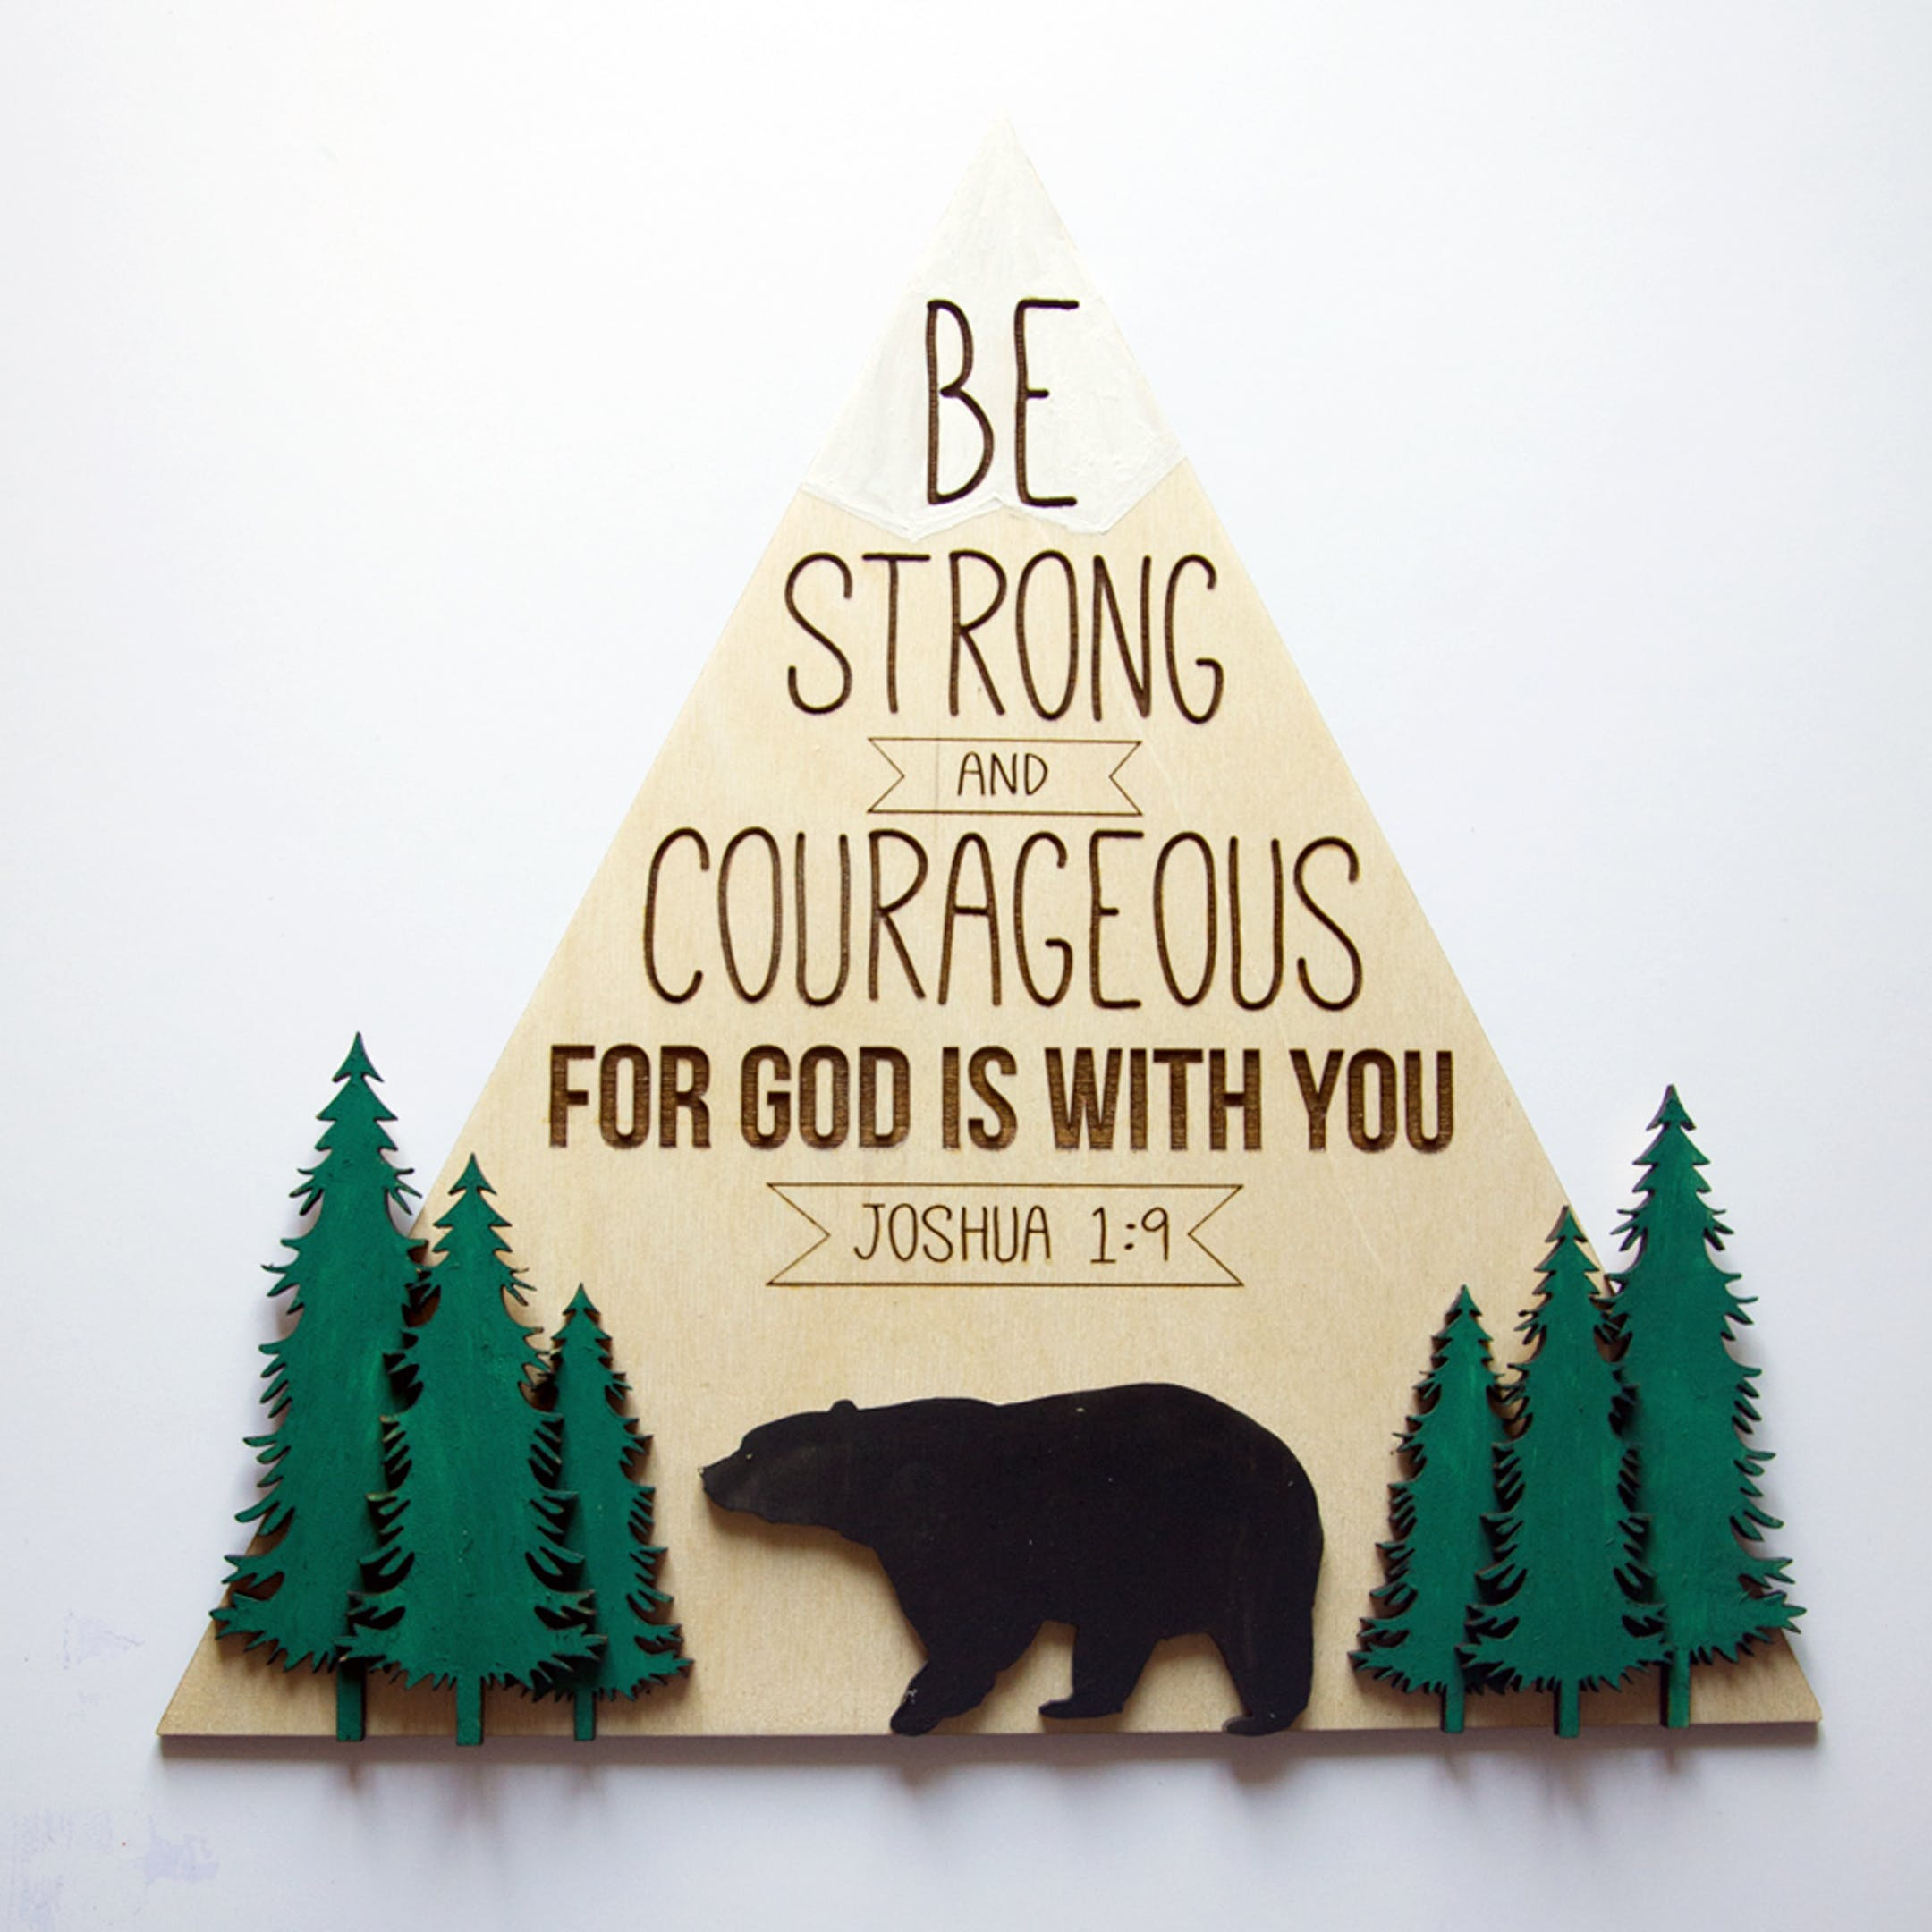 Couragous - Wooden Nursery Sign - Joshua 1:9 - Birch and Tides